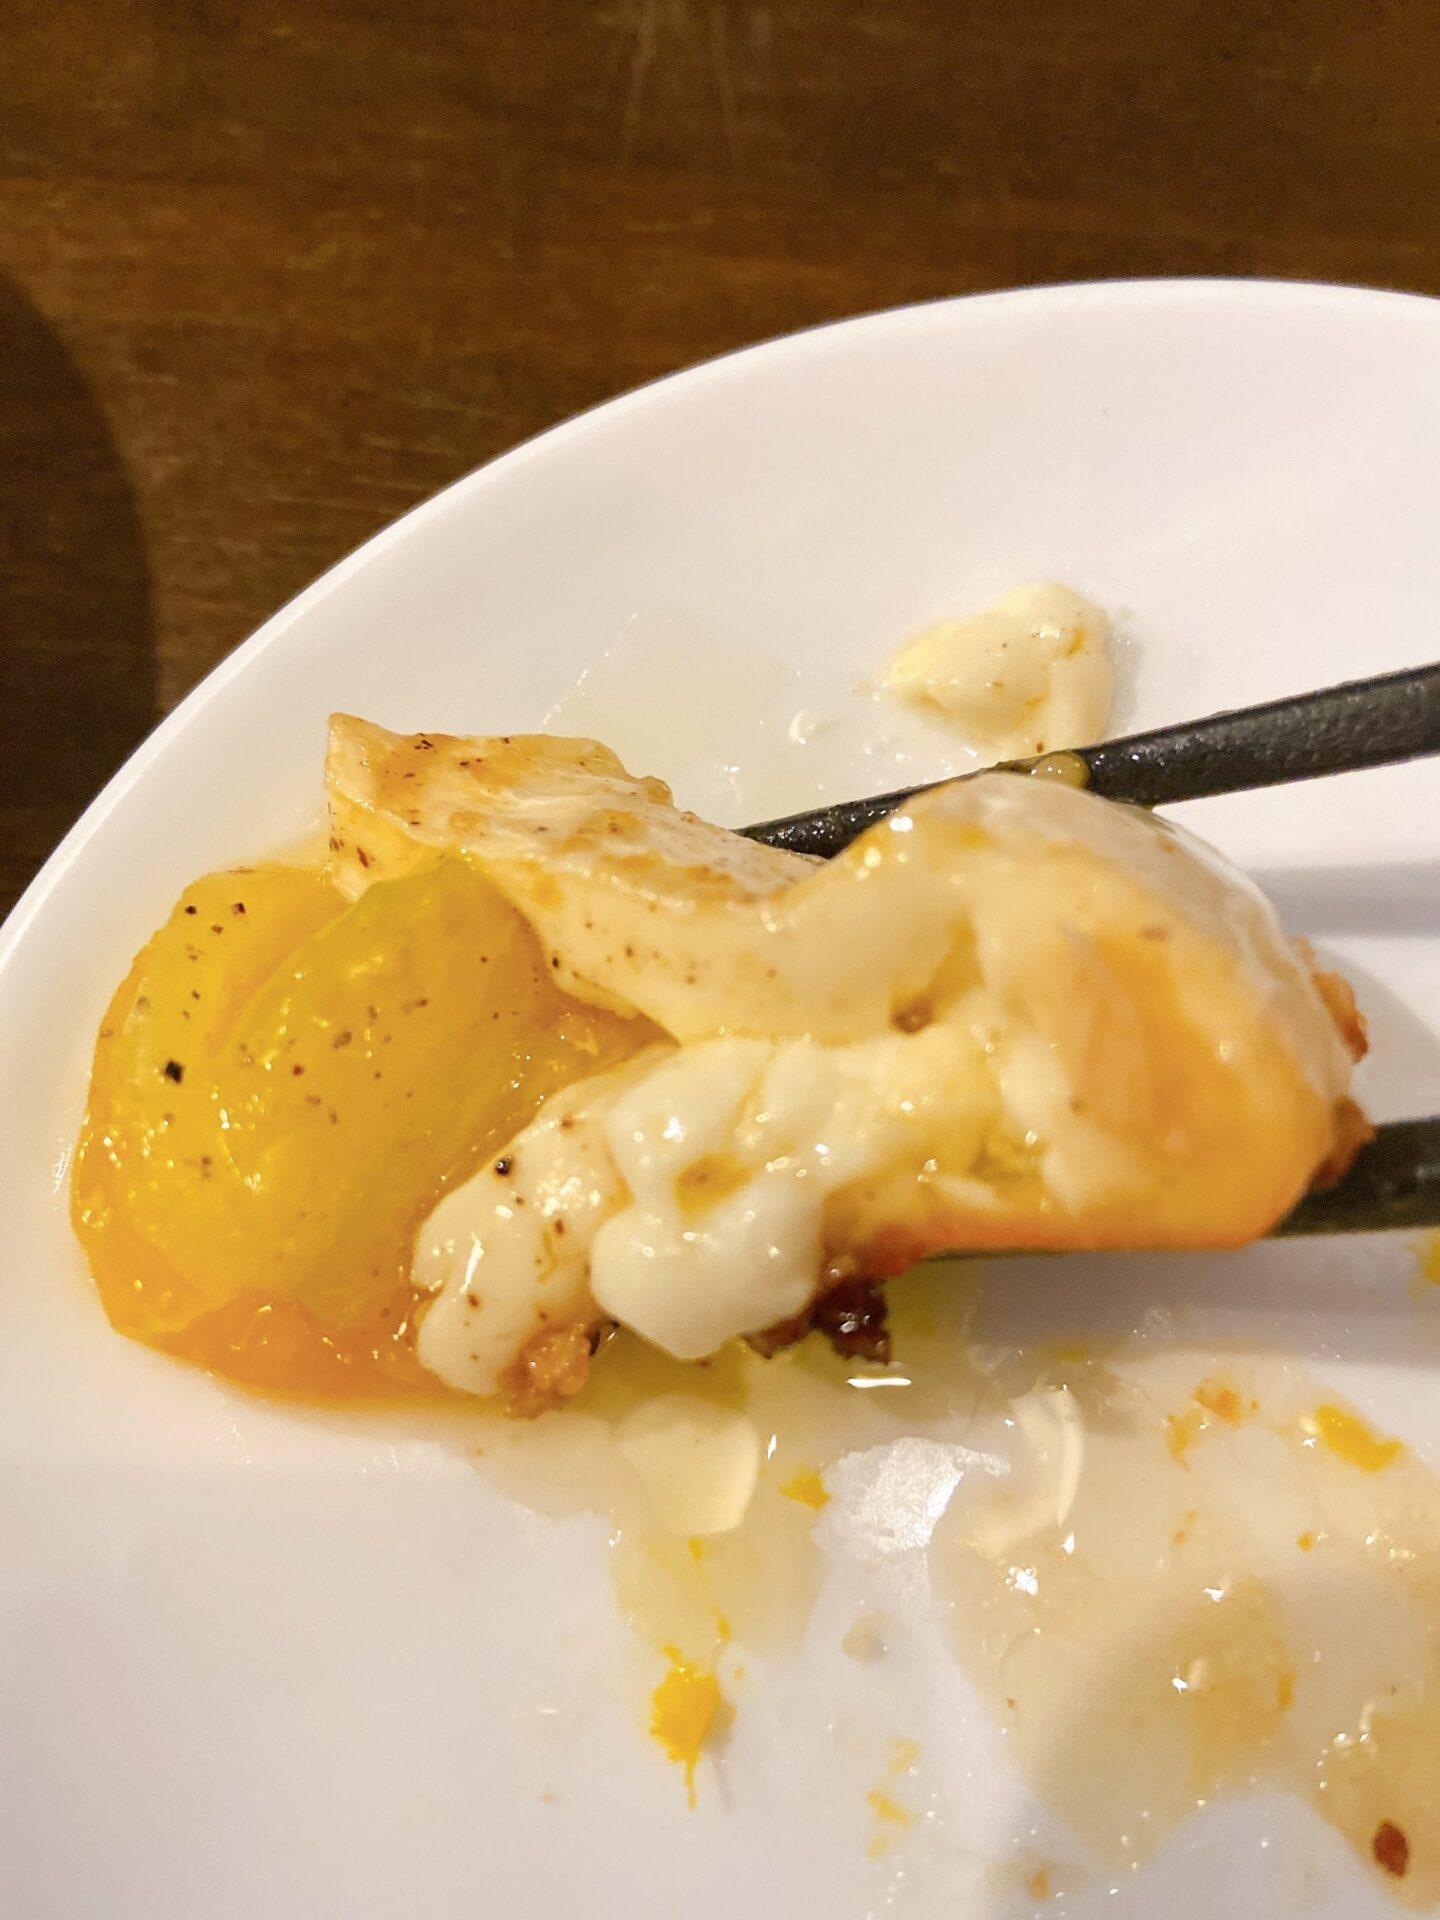 Emisaiのカマンベールチーズのアヒージョ